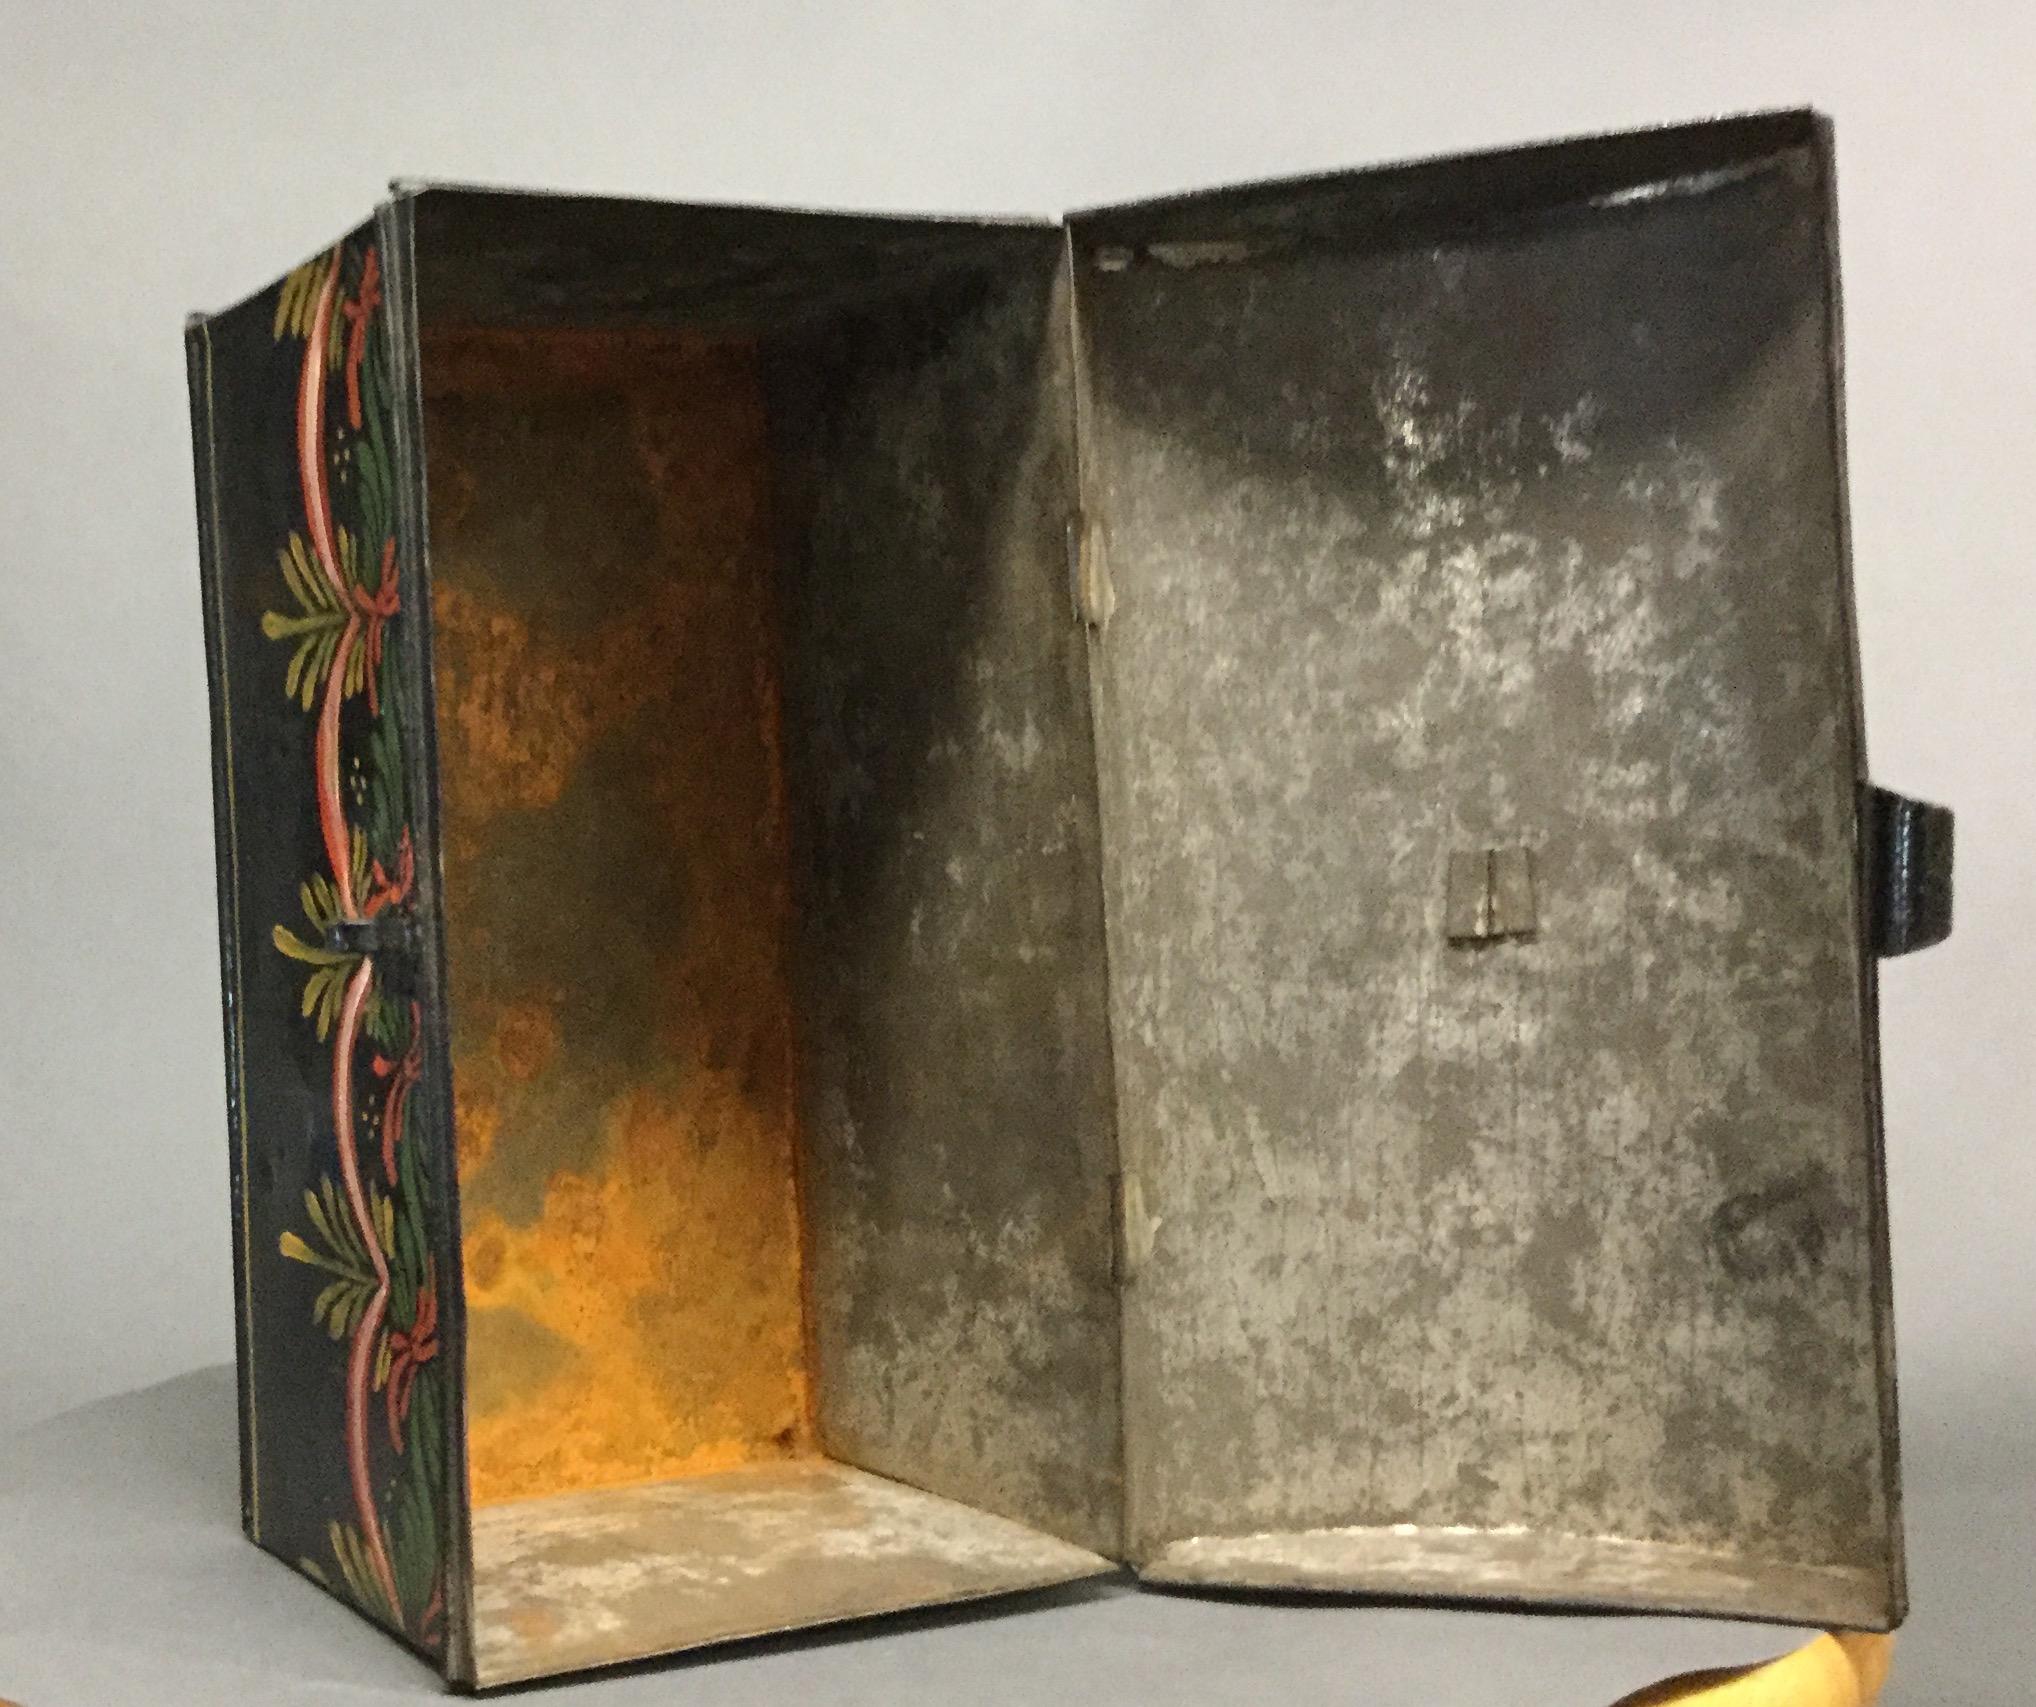 Antique-Tole-Painted-Document-Box_63324H.jpg